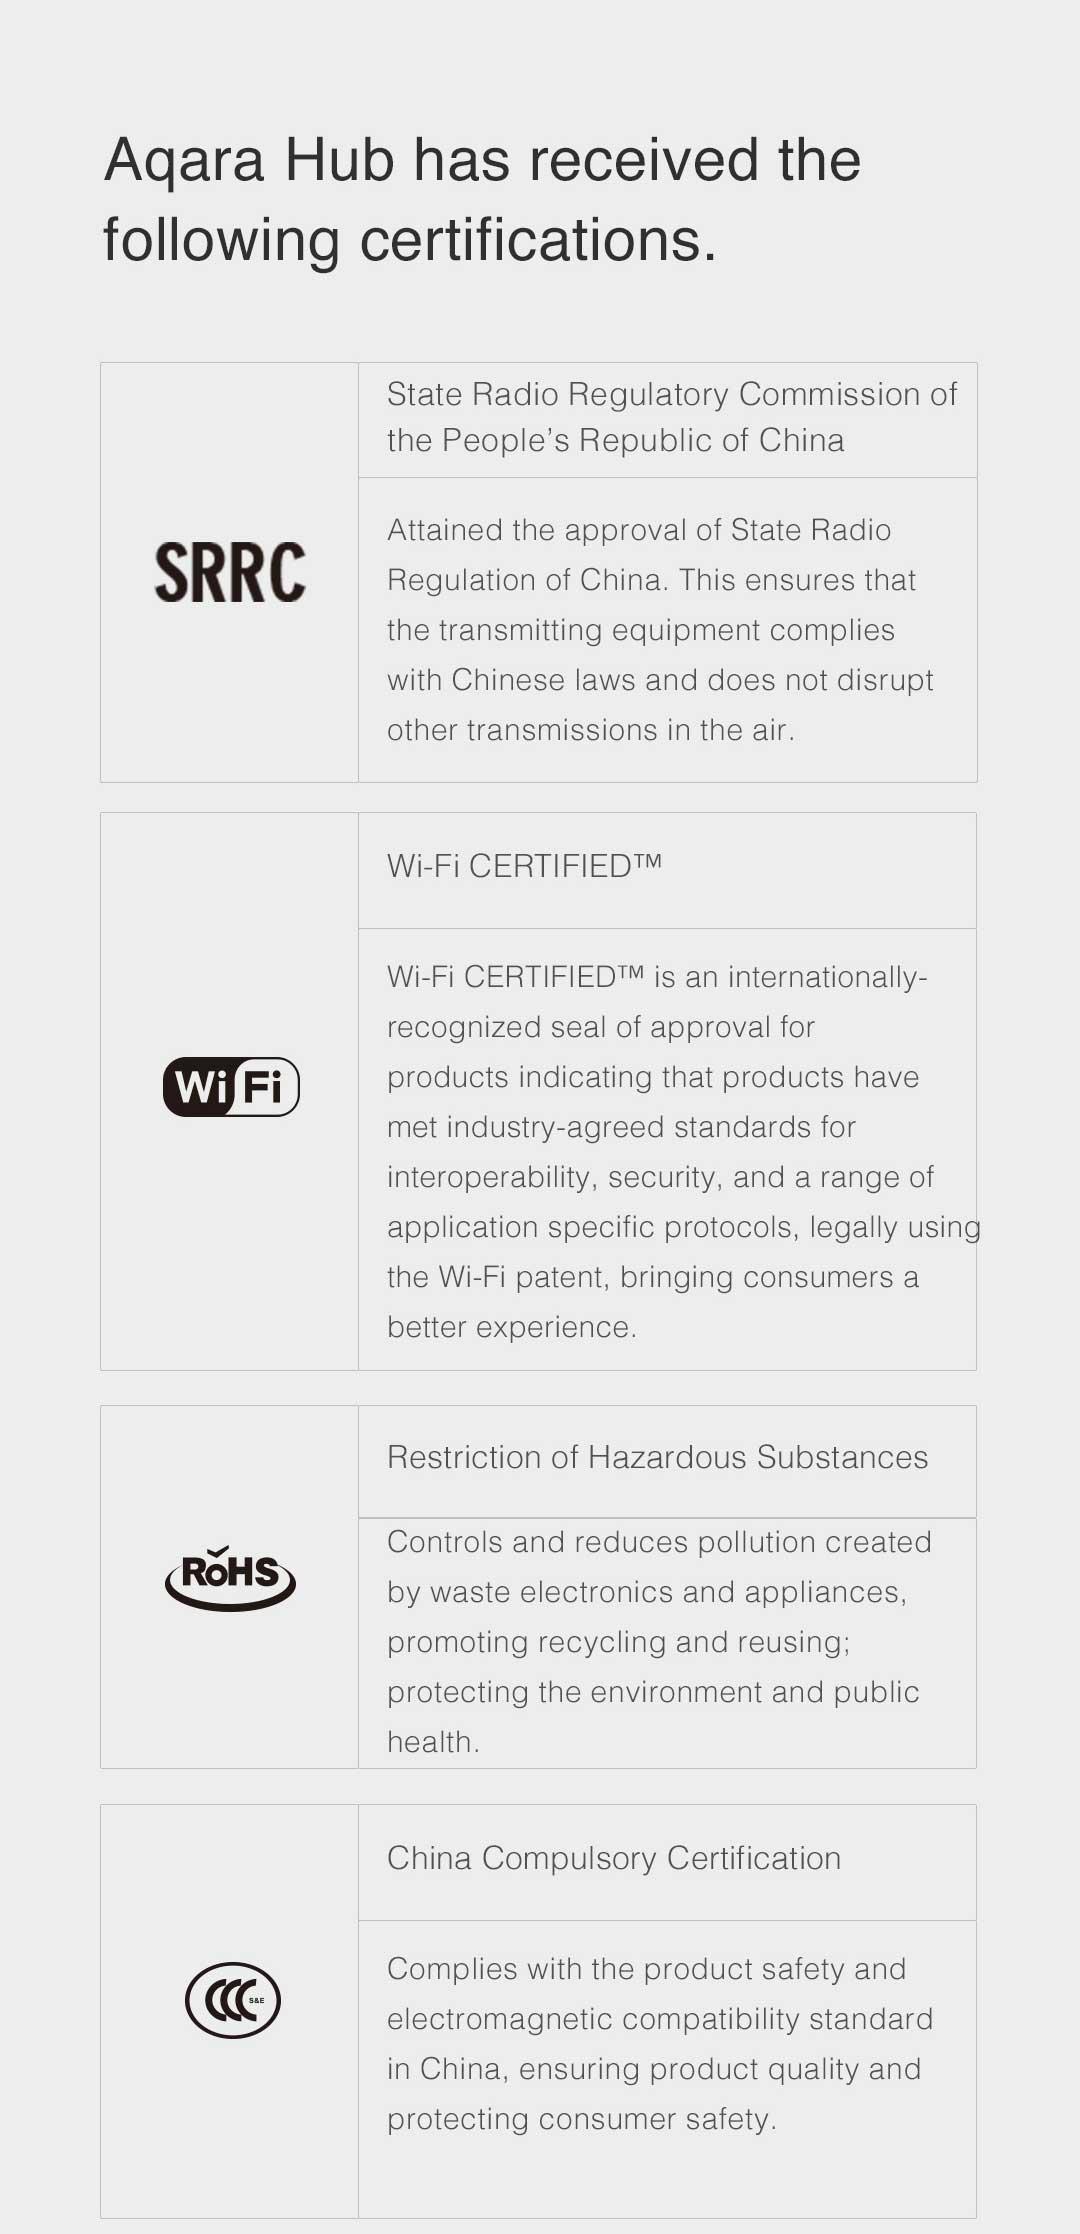 Aqara Hub Has Received the Following Certifications 1